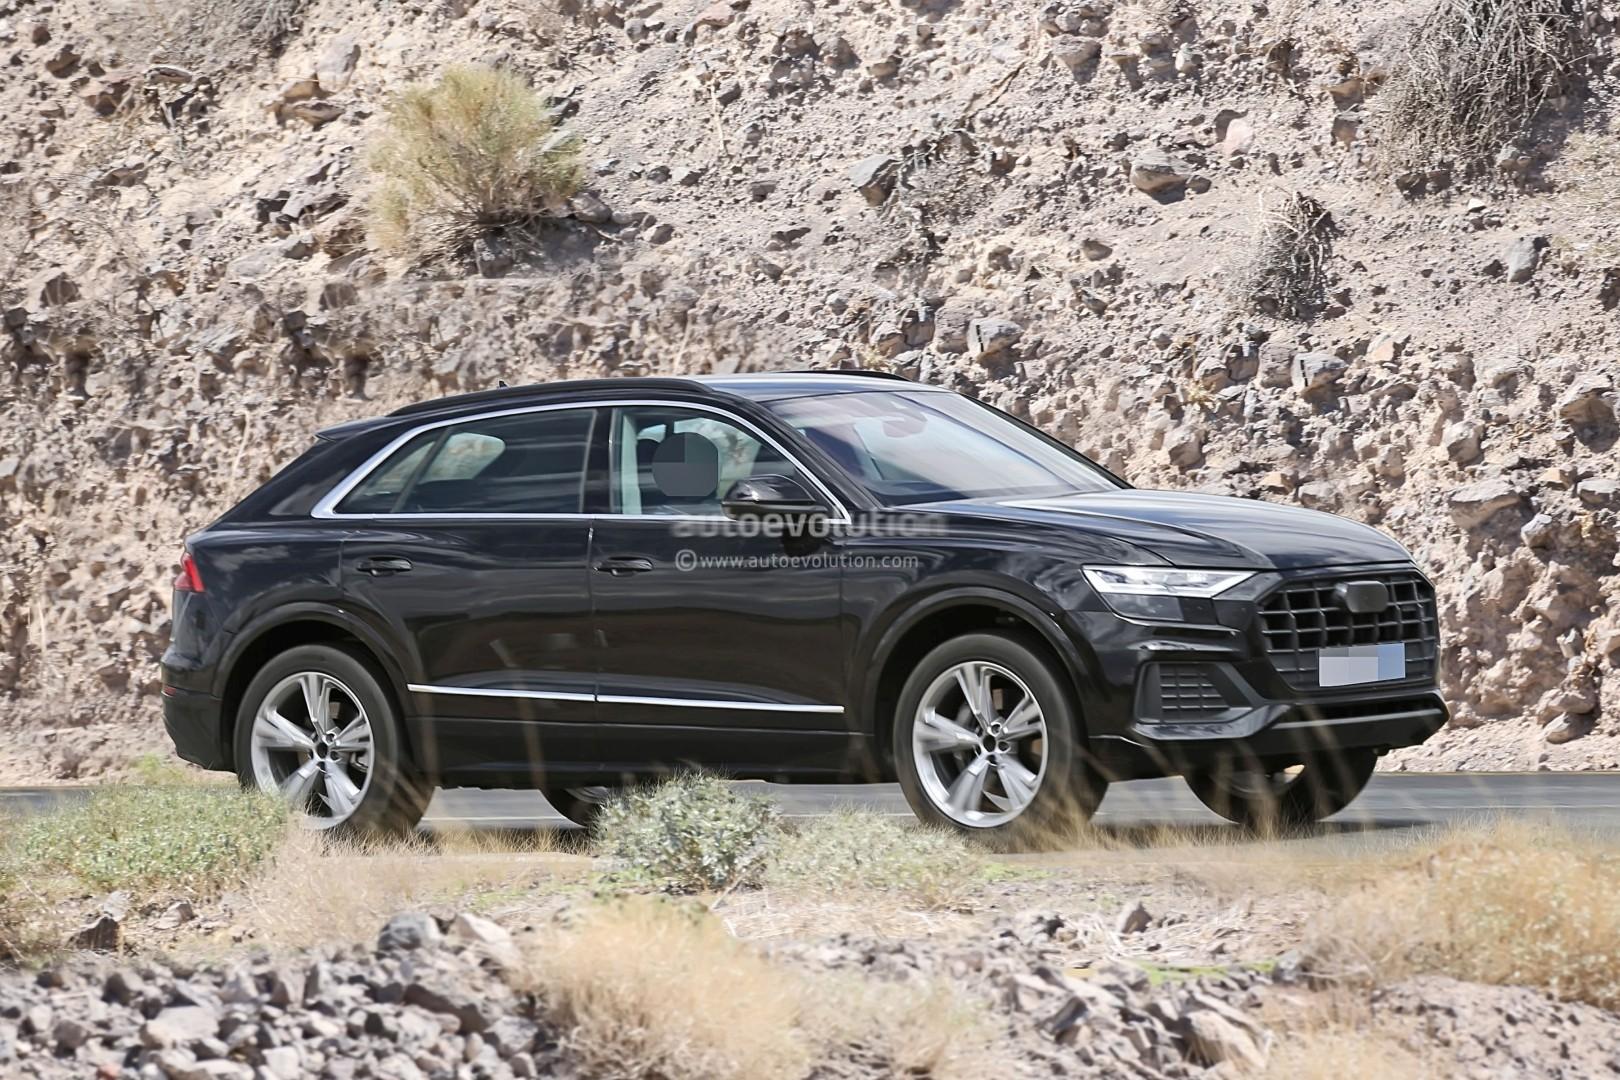 Audi Q8 Halo SUV Model Confirmed: Q7 Platform and Prologue ...